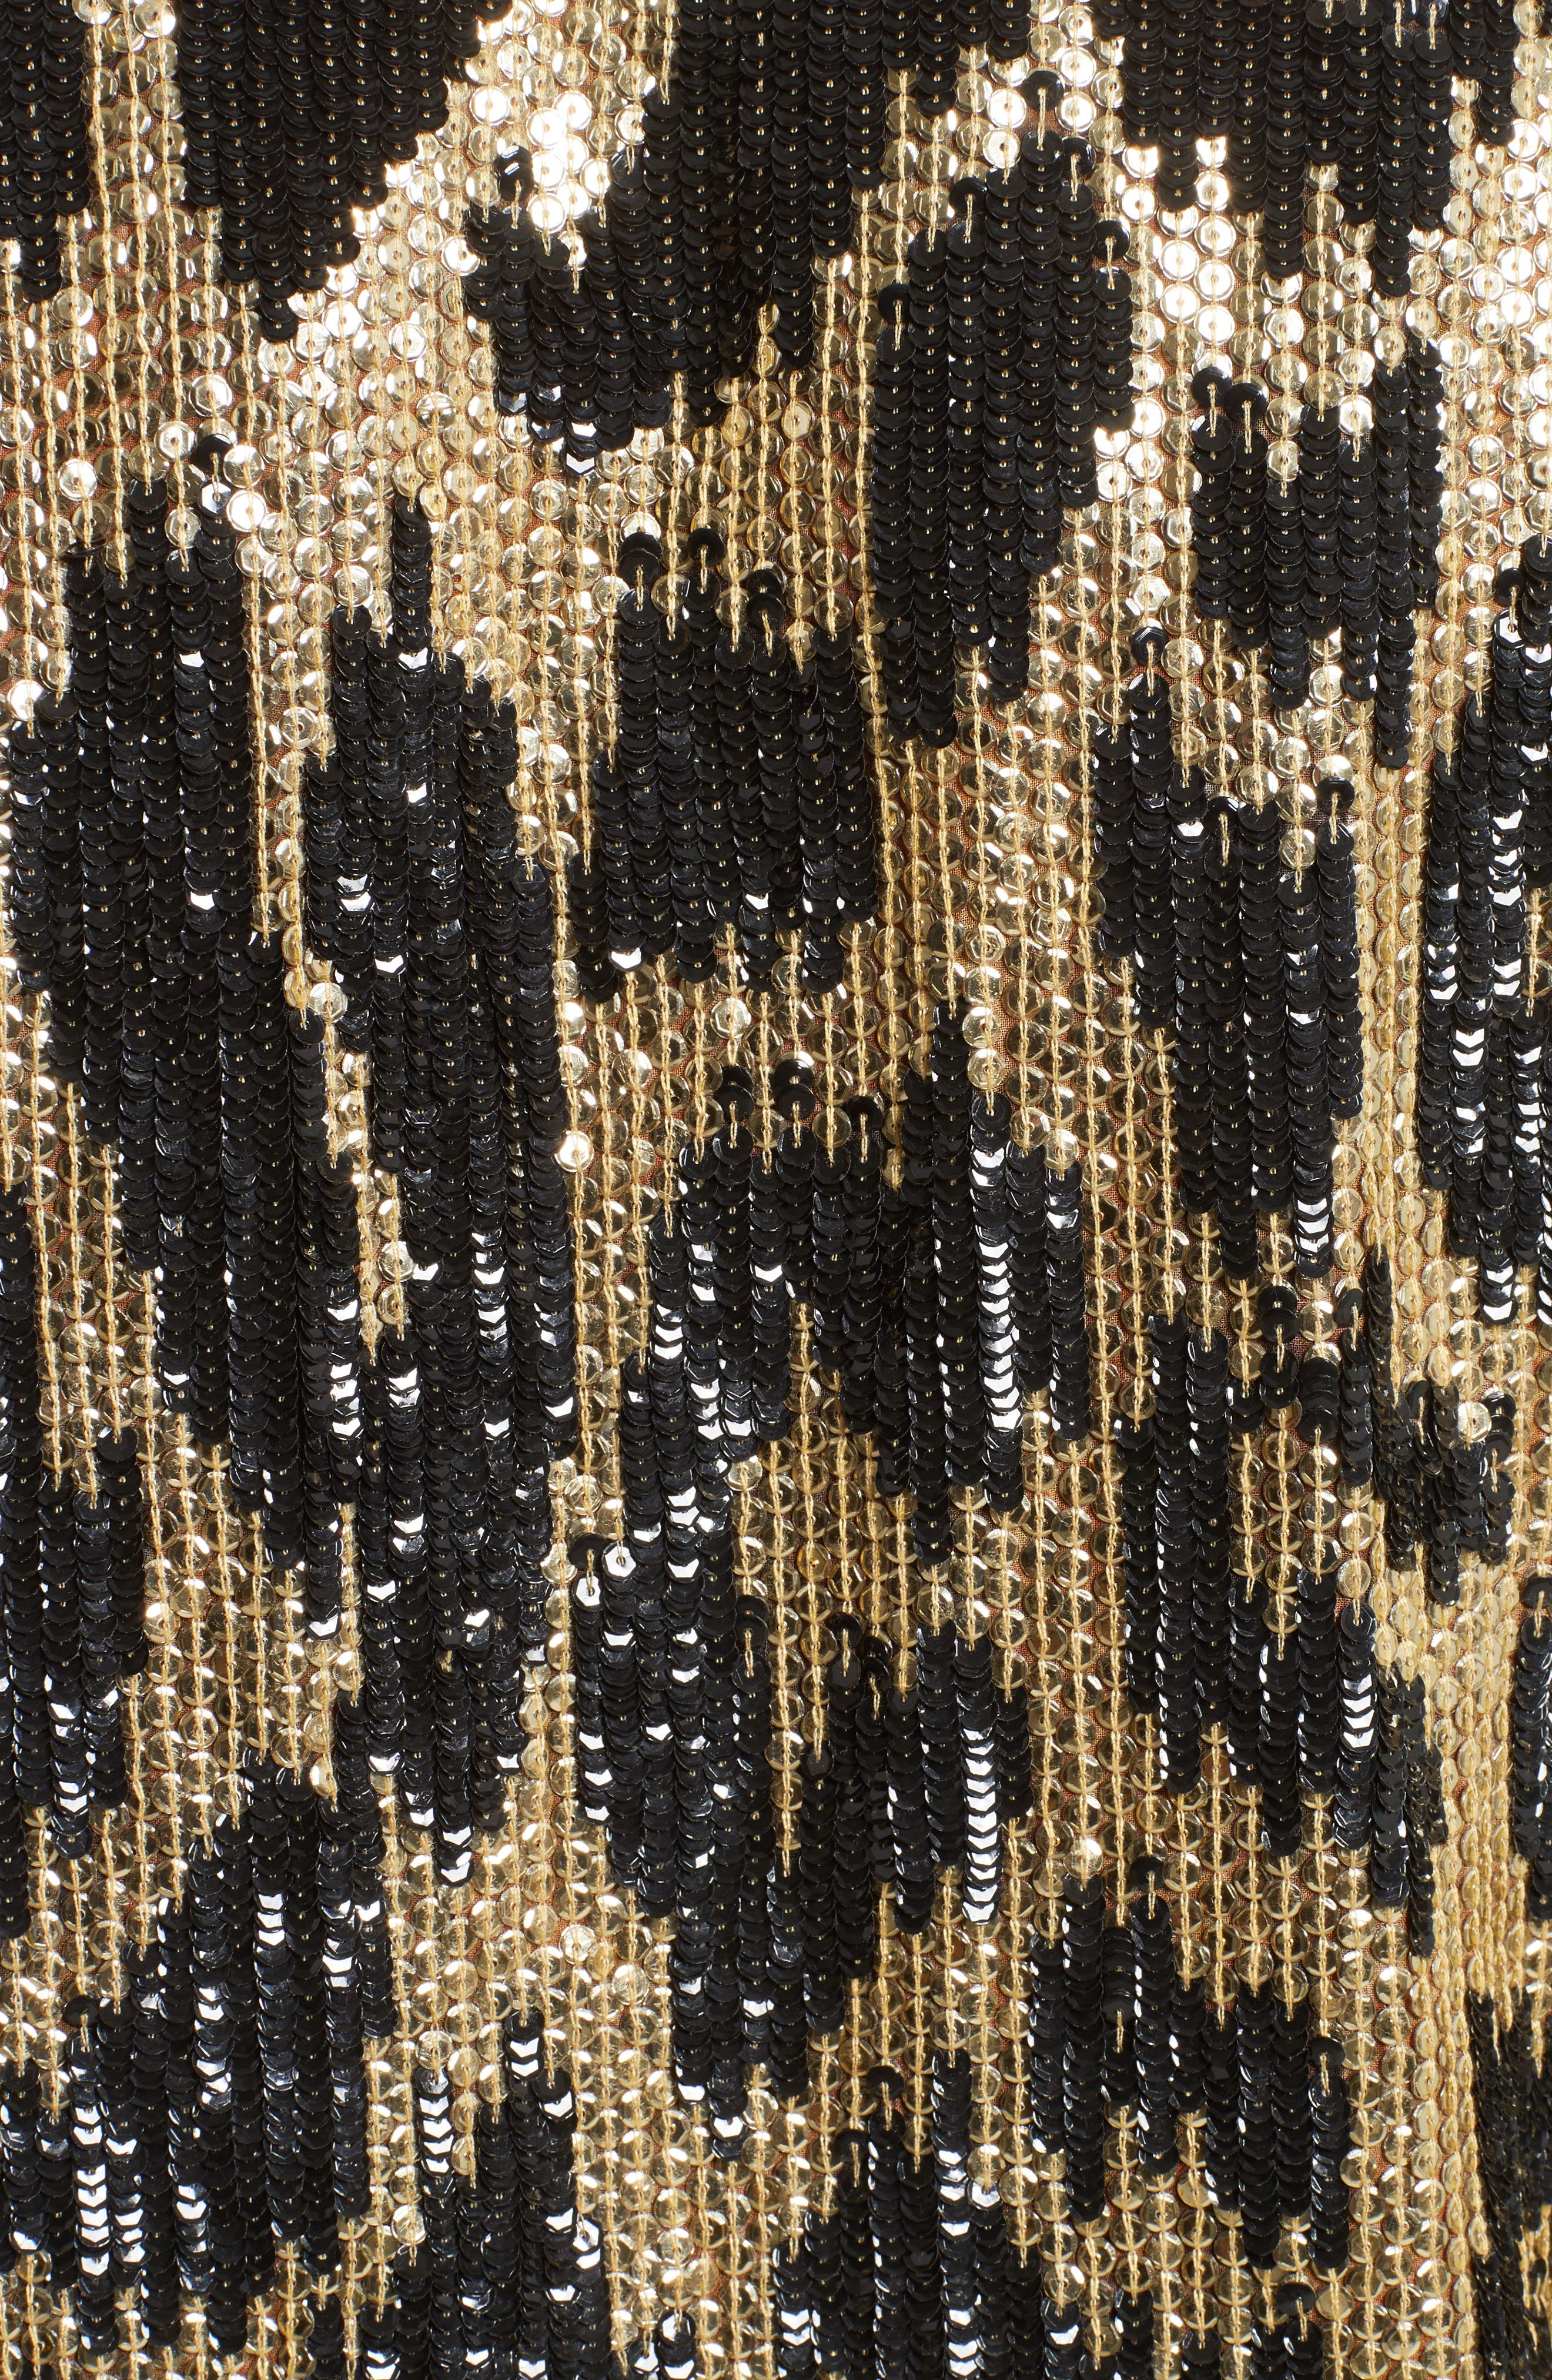 Cheetah Print Sequin Jacket,                             Alternate thumbnail 5, color,                             Black/ Gold